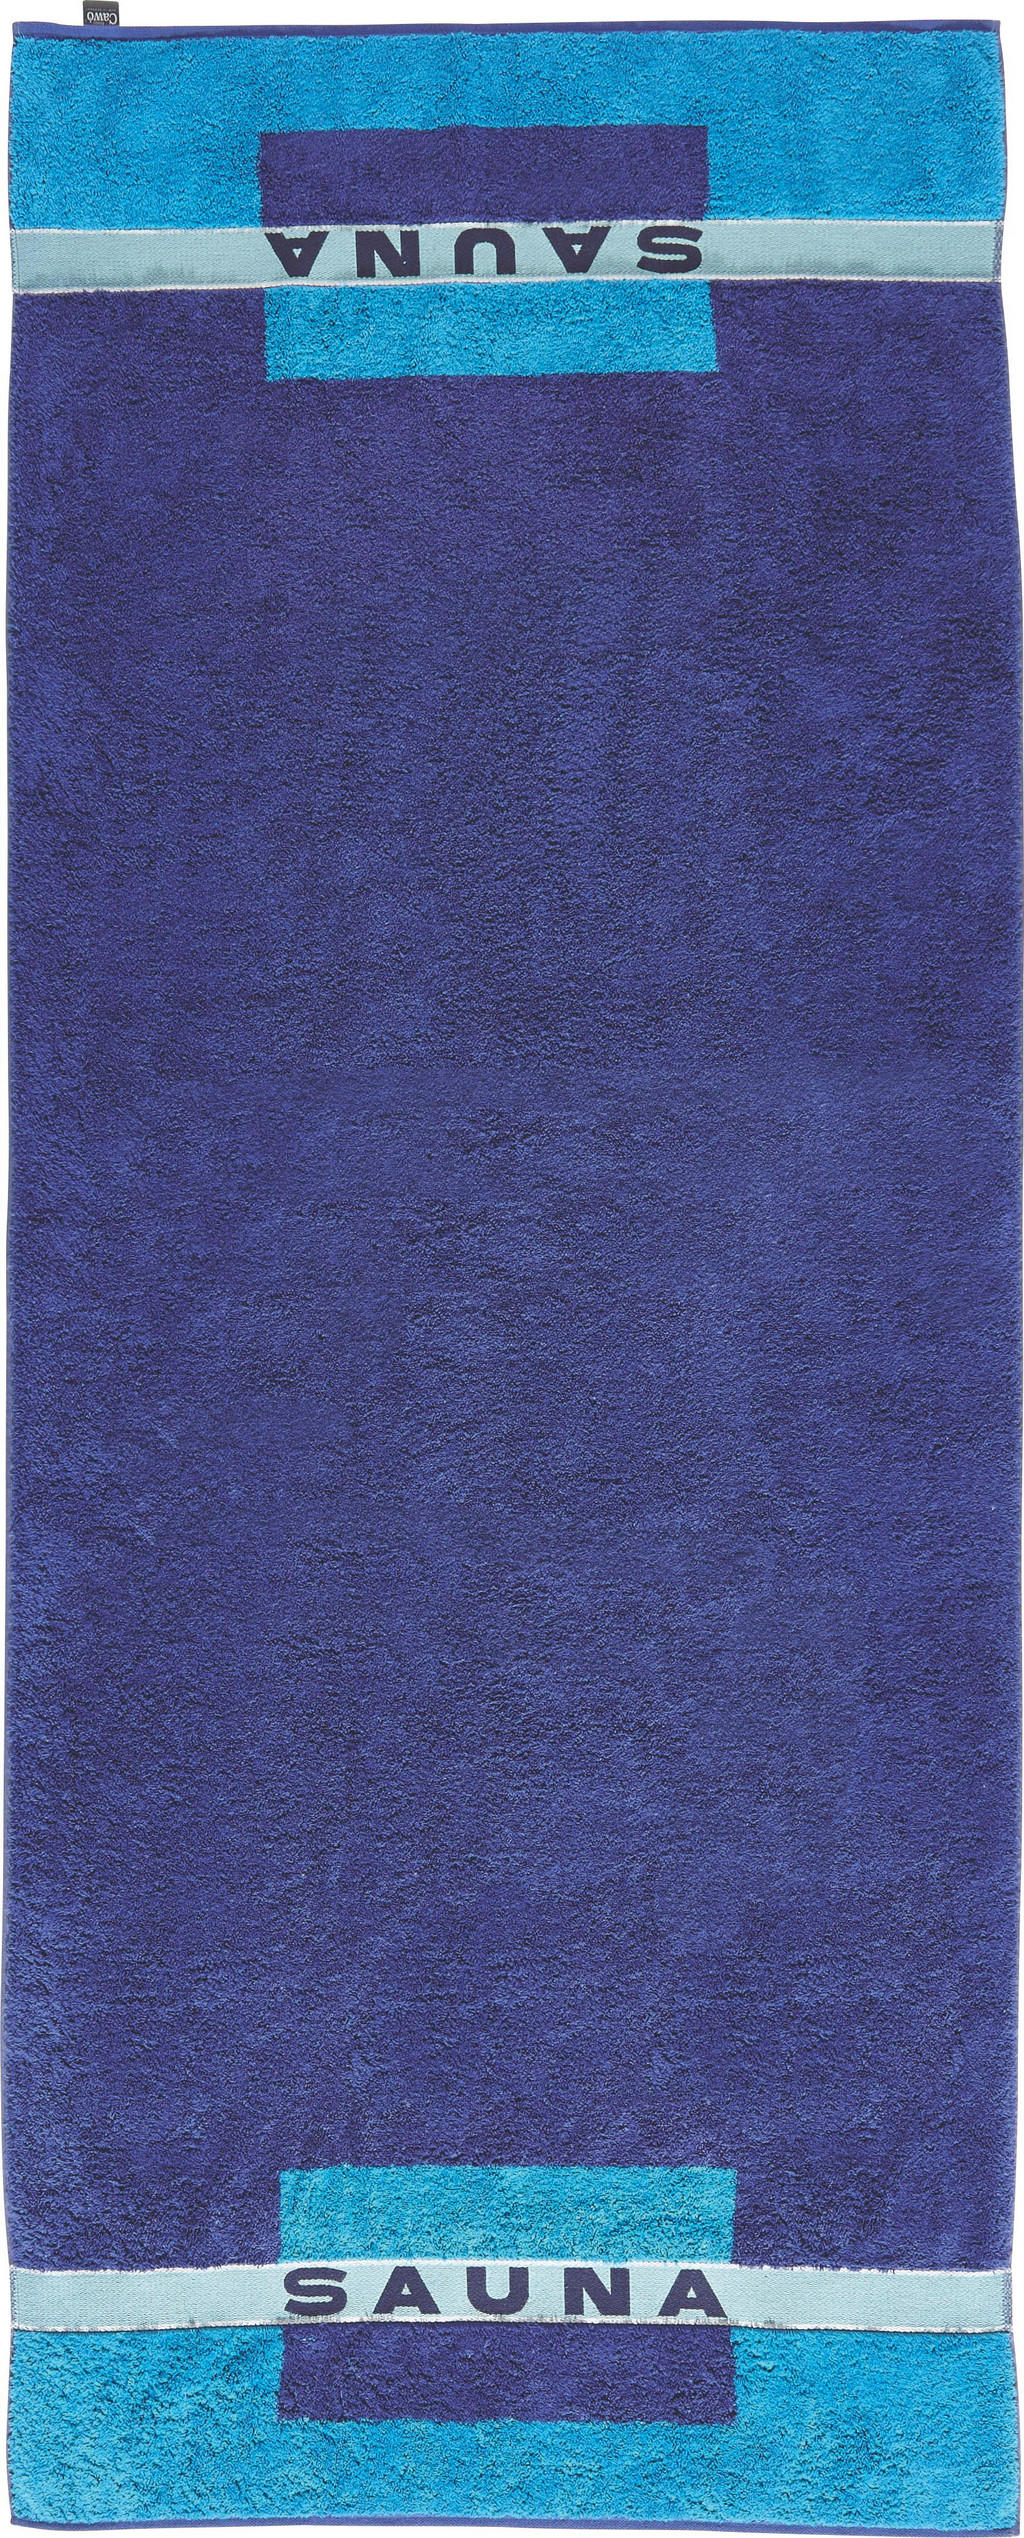 CAWOE SAUNATUCH 80/200 cm, Blau